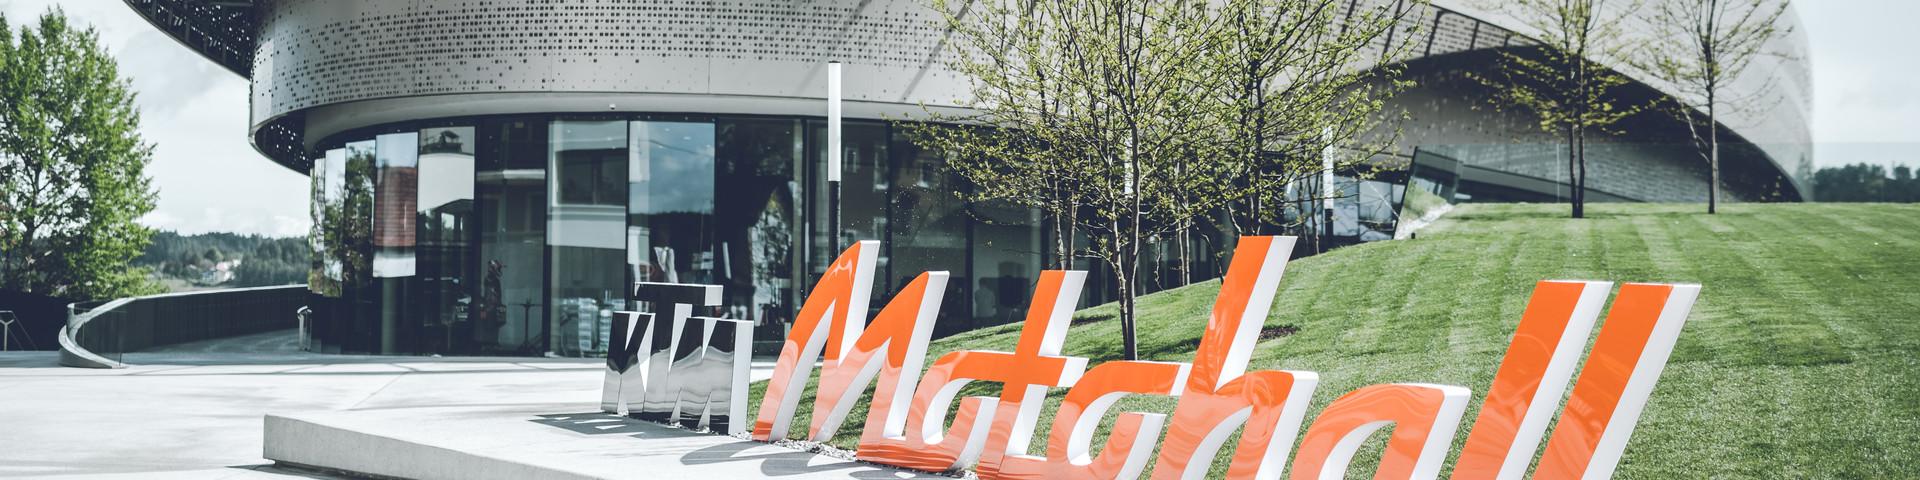 KTM Motohall - Außenansicht © KTM Motohall